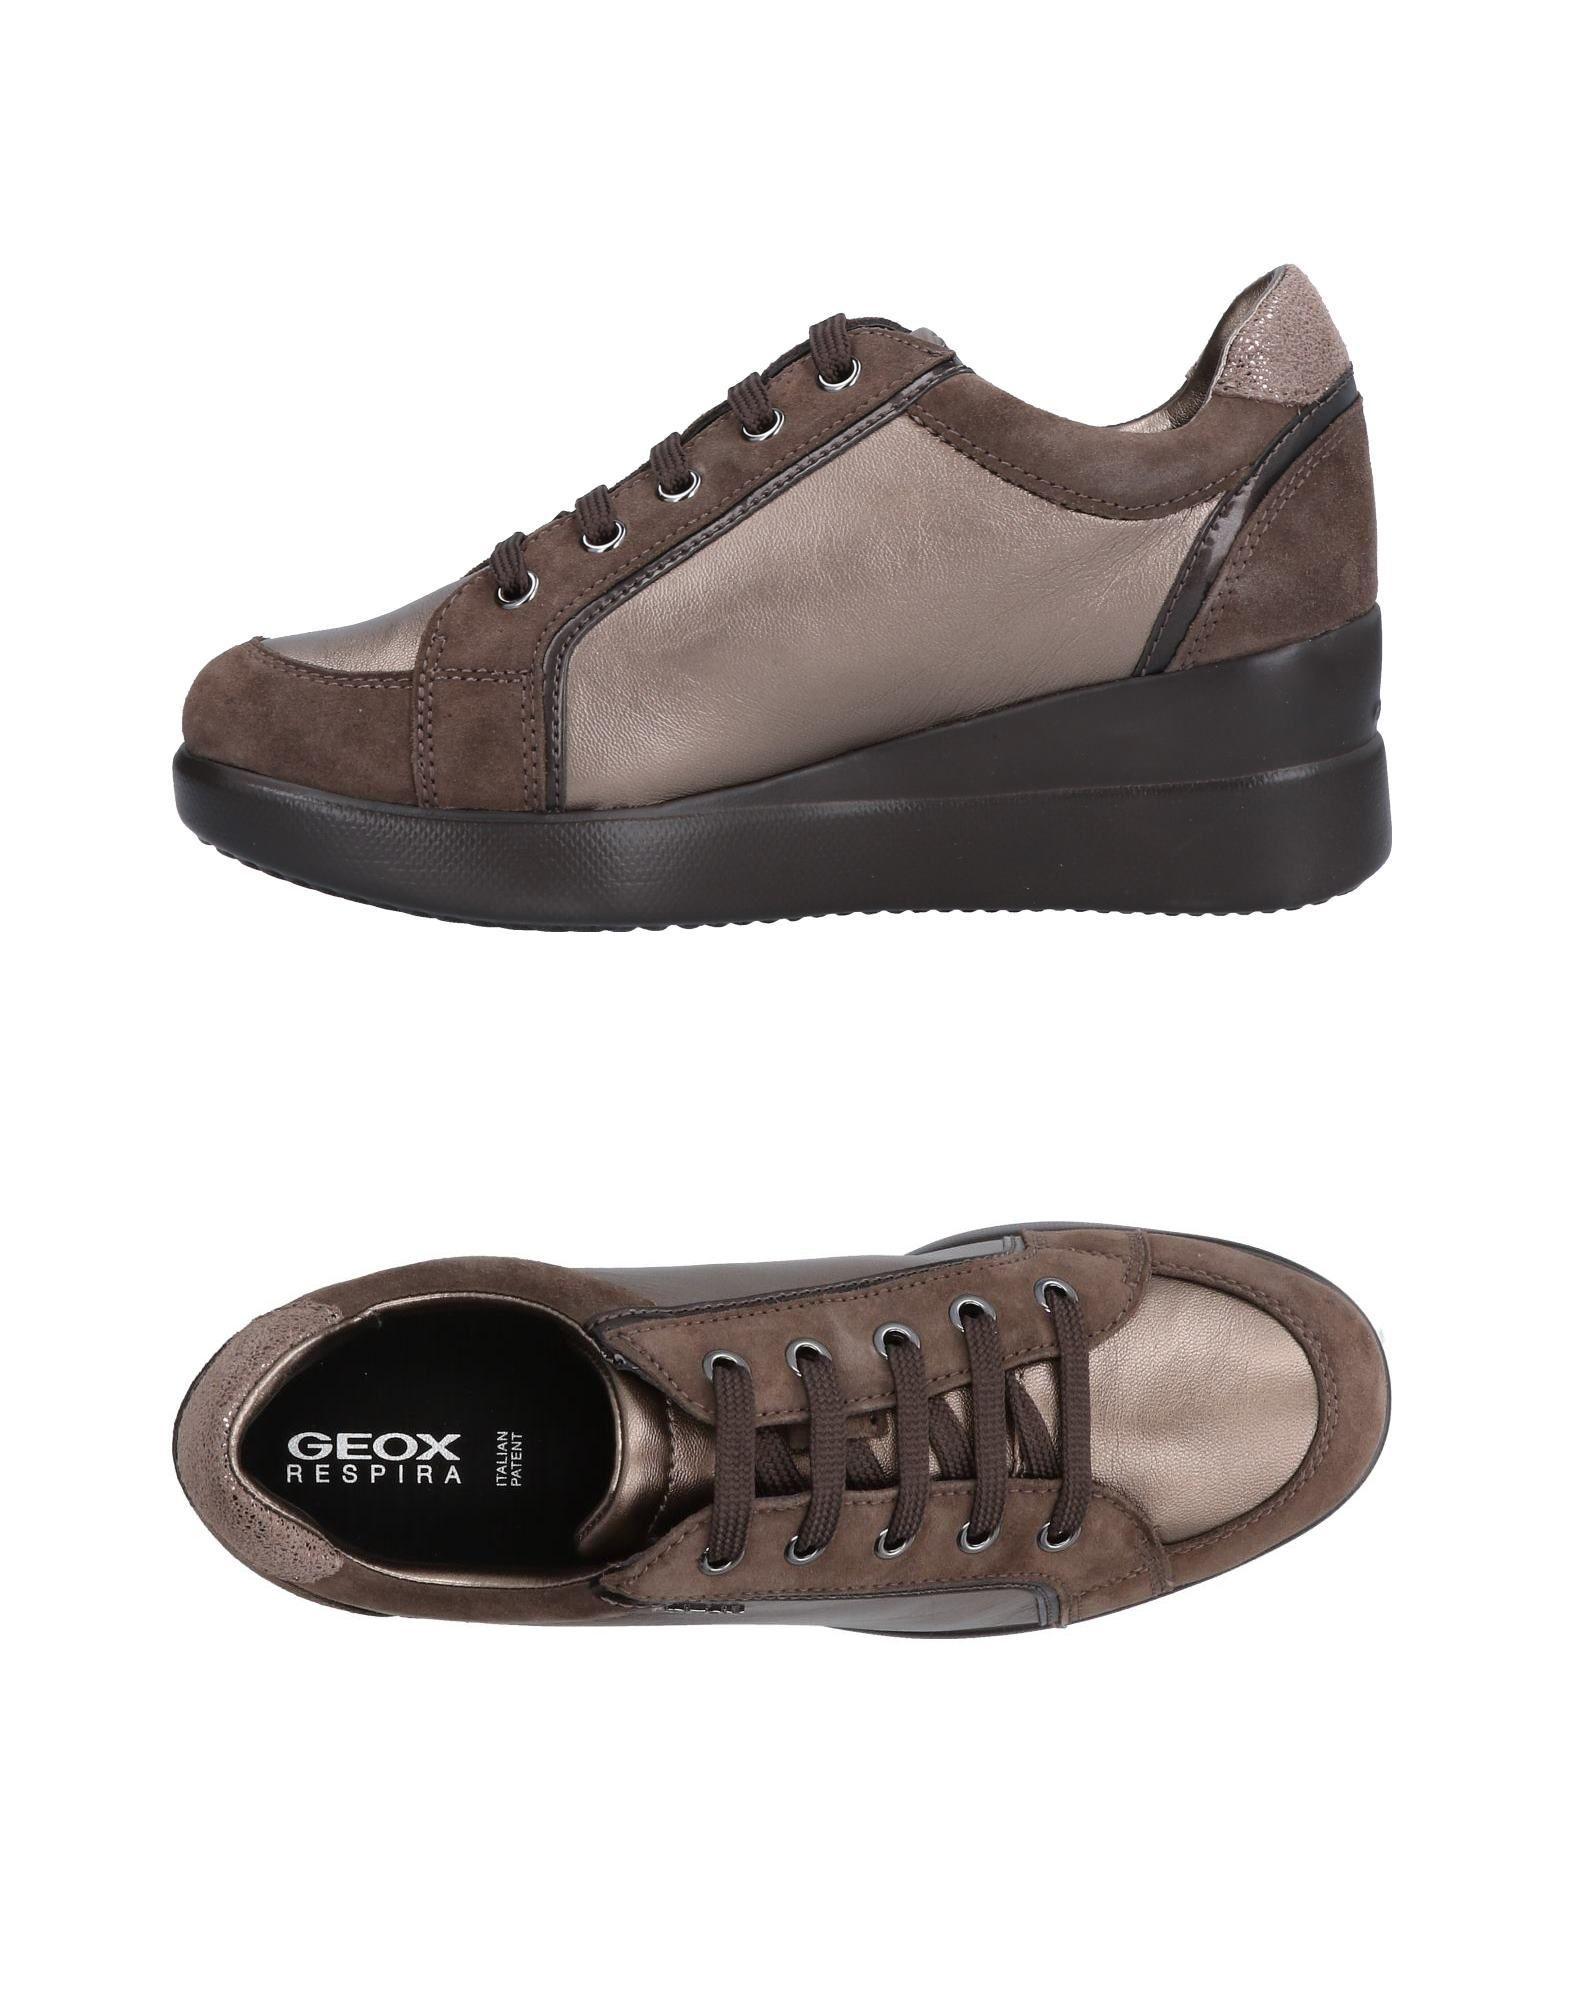 Caqui Zapatillas Geox Mujer - Zapatillas Geox Geox Geox 8b5ed1